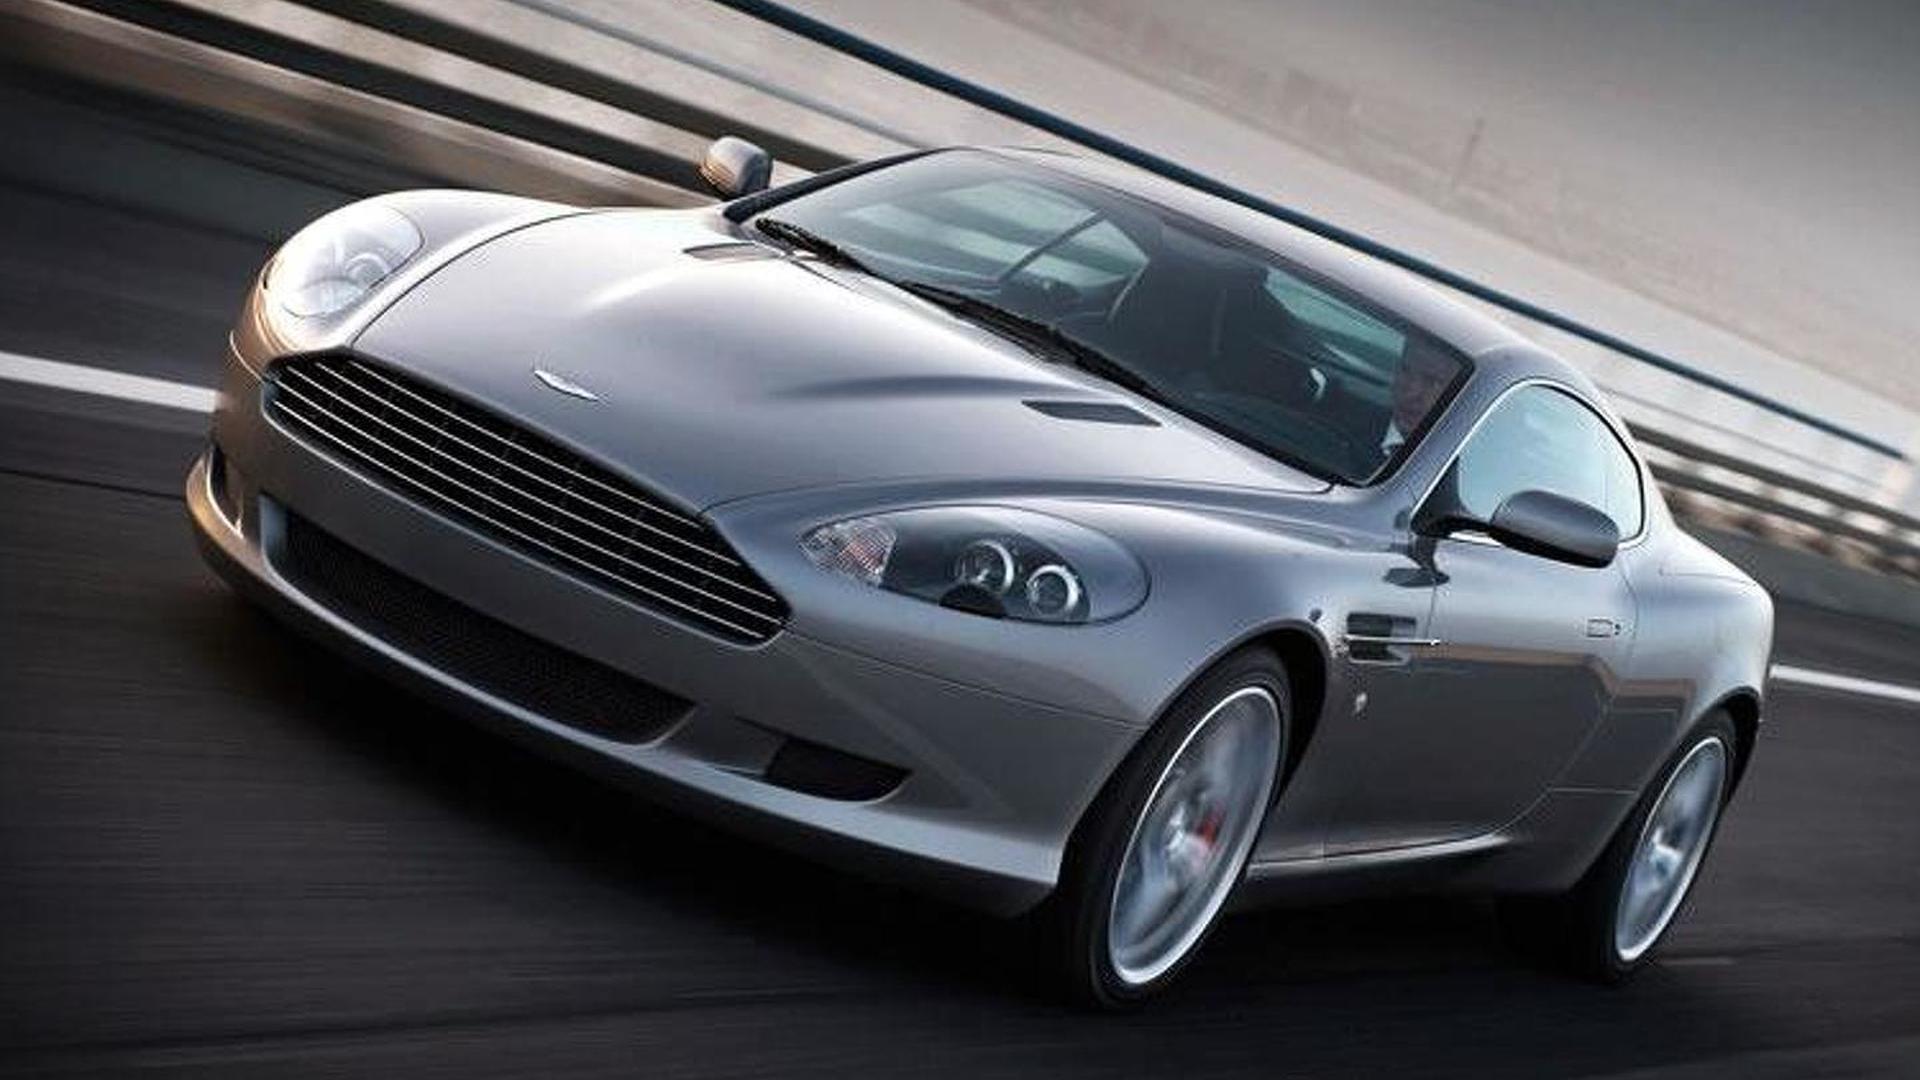 Aston Martin trademarking DB10 DB11 DB12 DB13  DB14